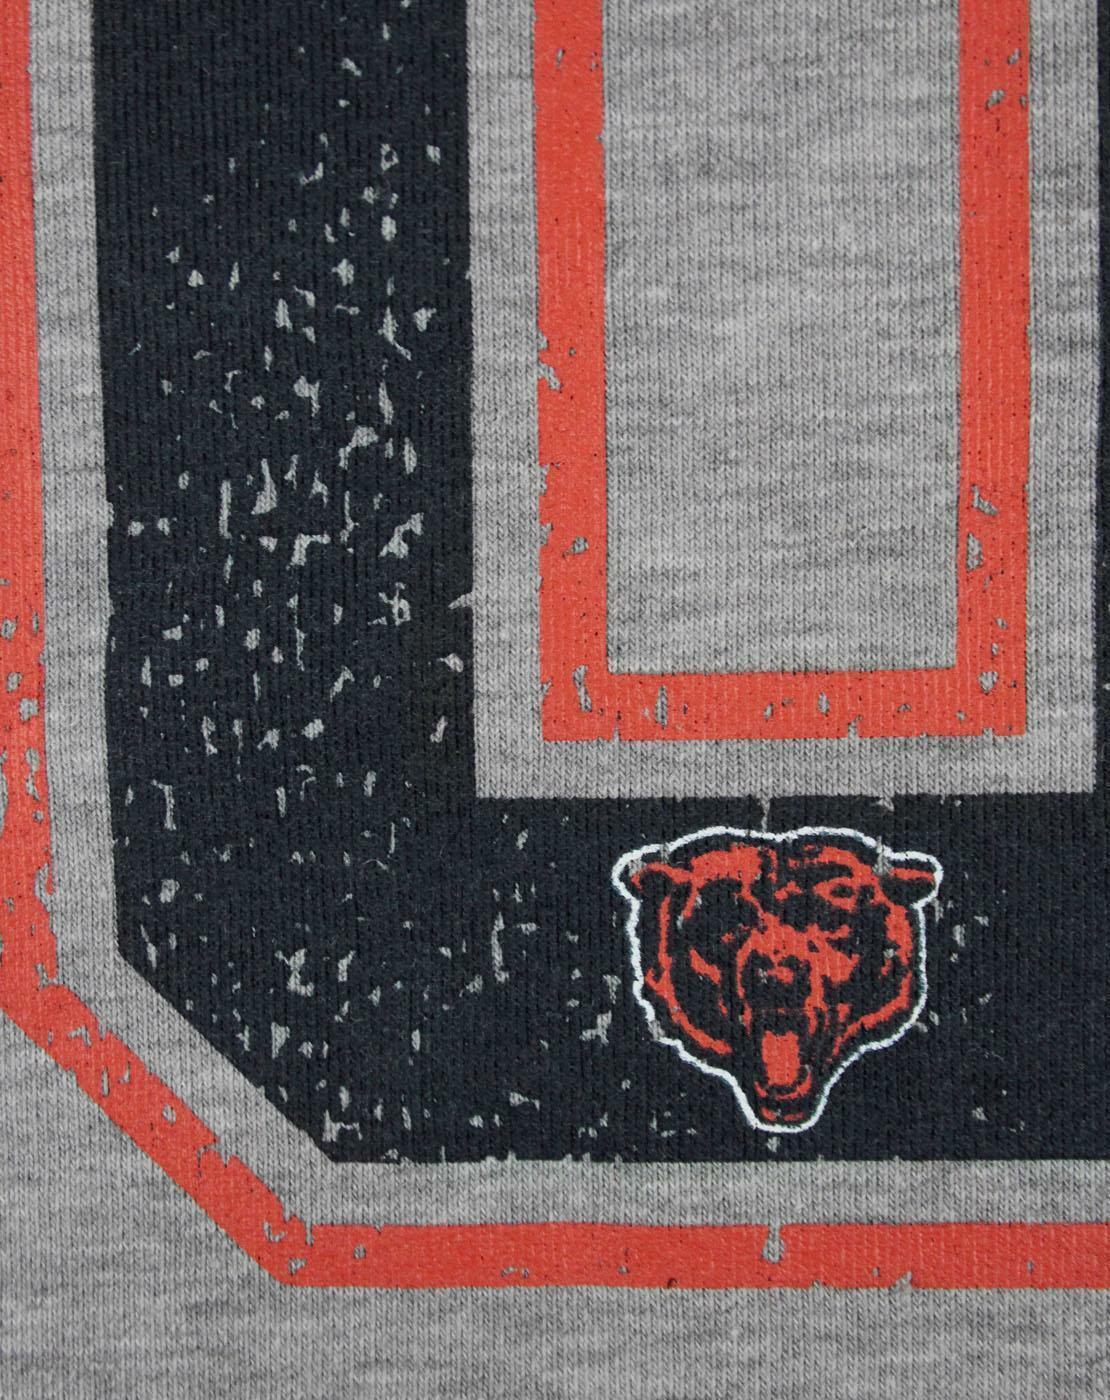 New-Era-NFL-Chicago-Bears-Vintage-Number-Men-039-s-Sweater miniatura 8